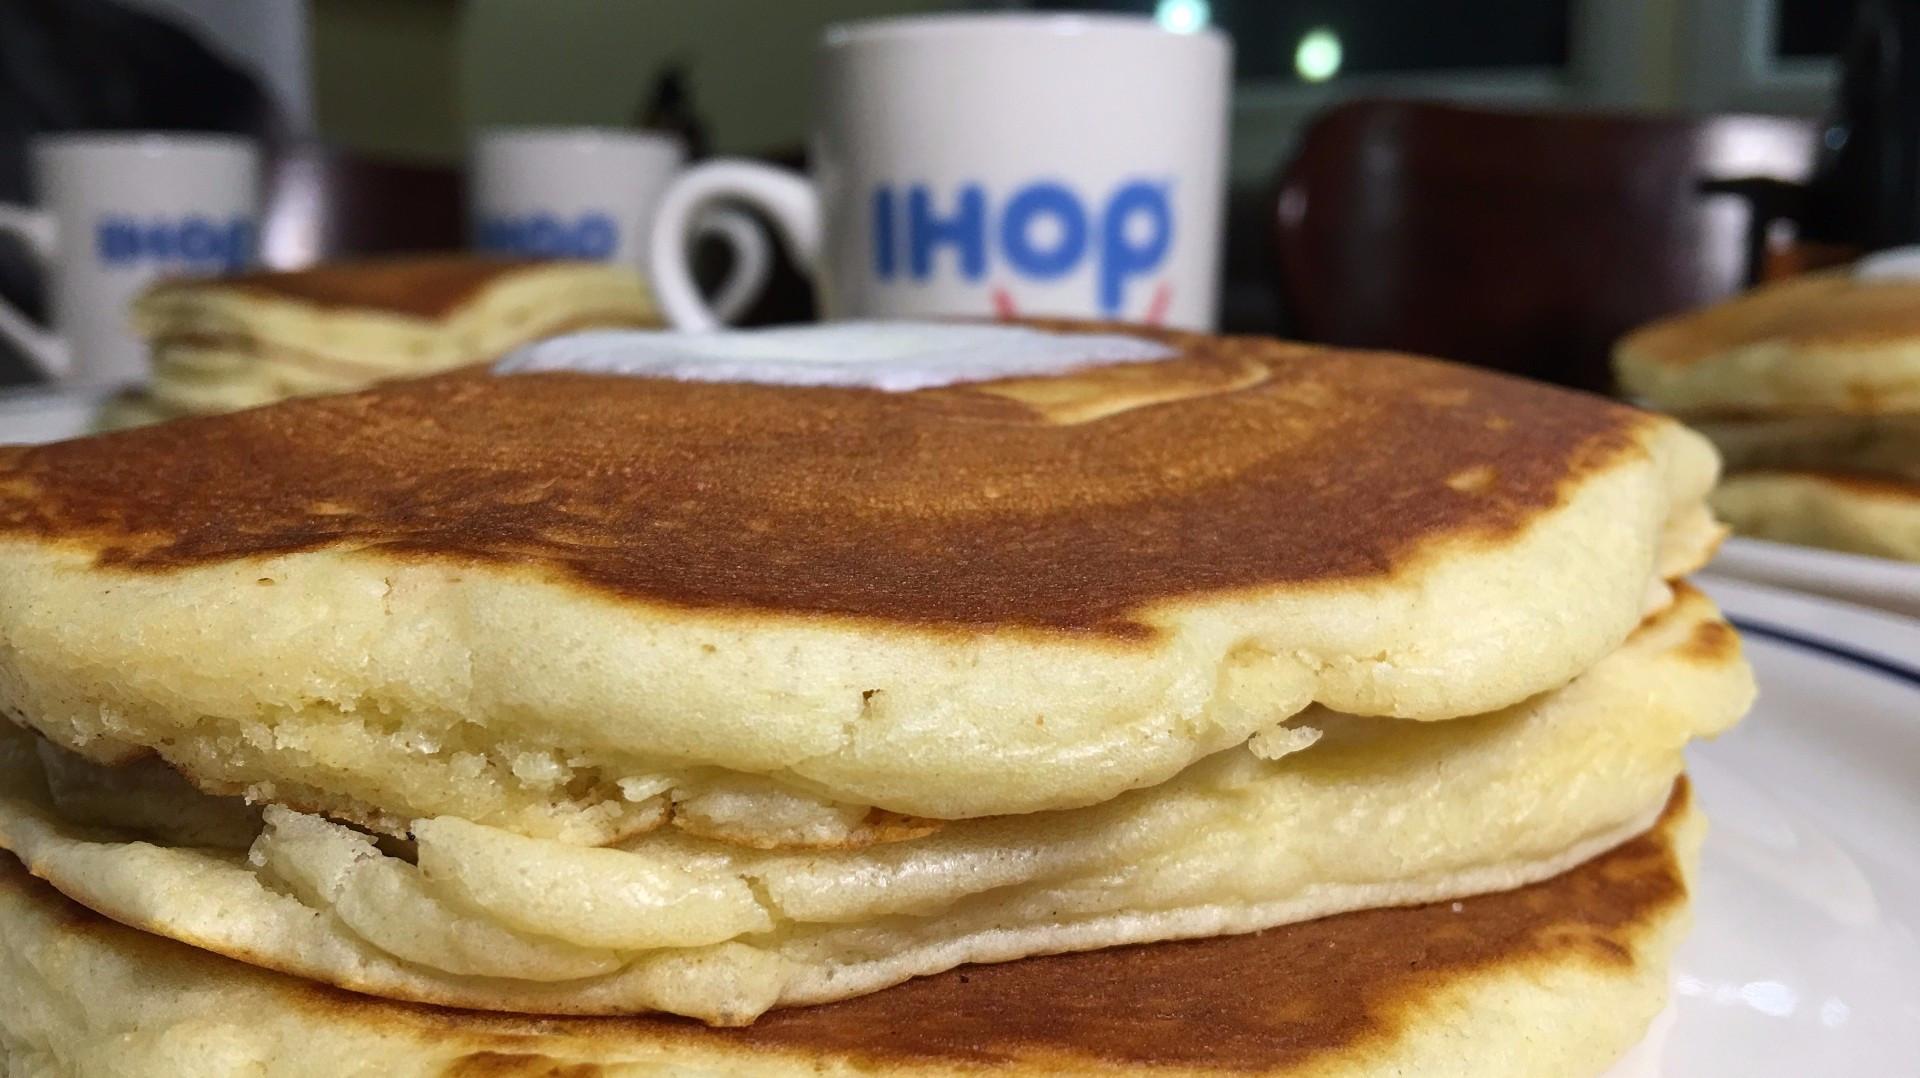 Ihop Free Pancakes  12news